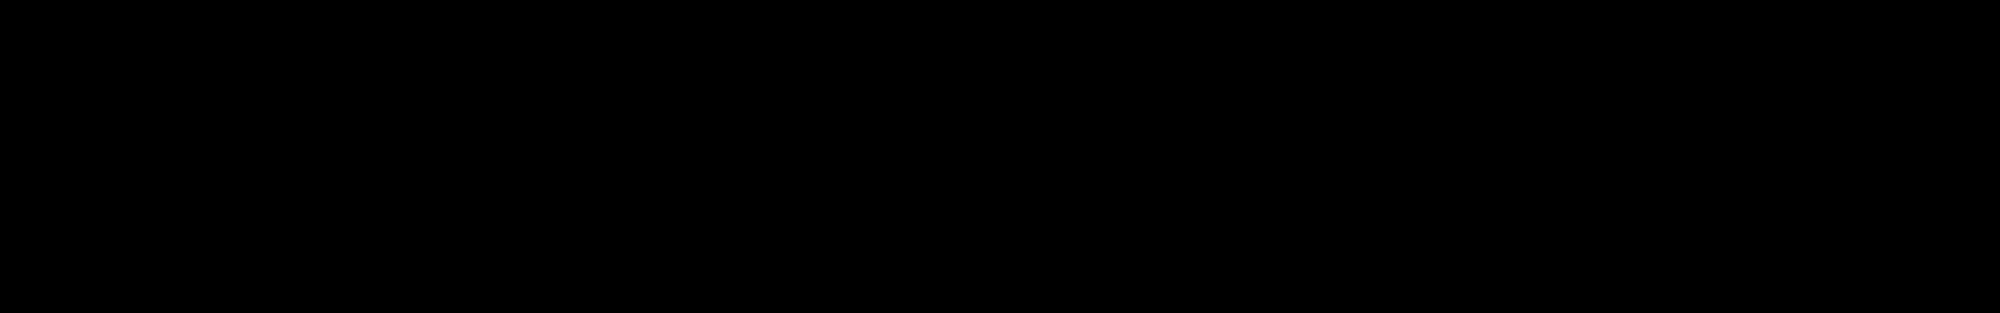 File:Arnold Boecklin typeface.svg.